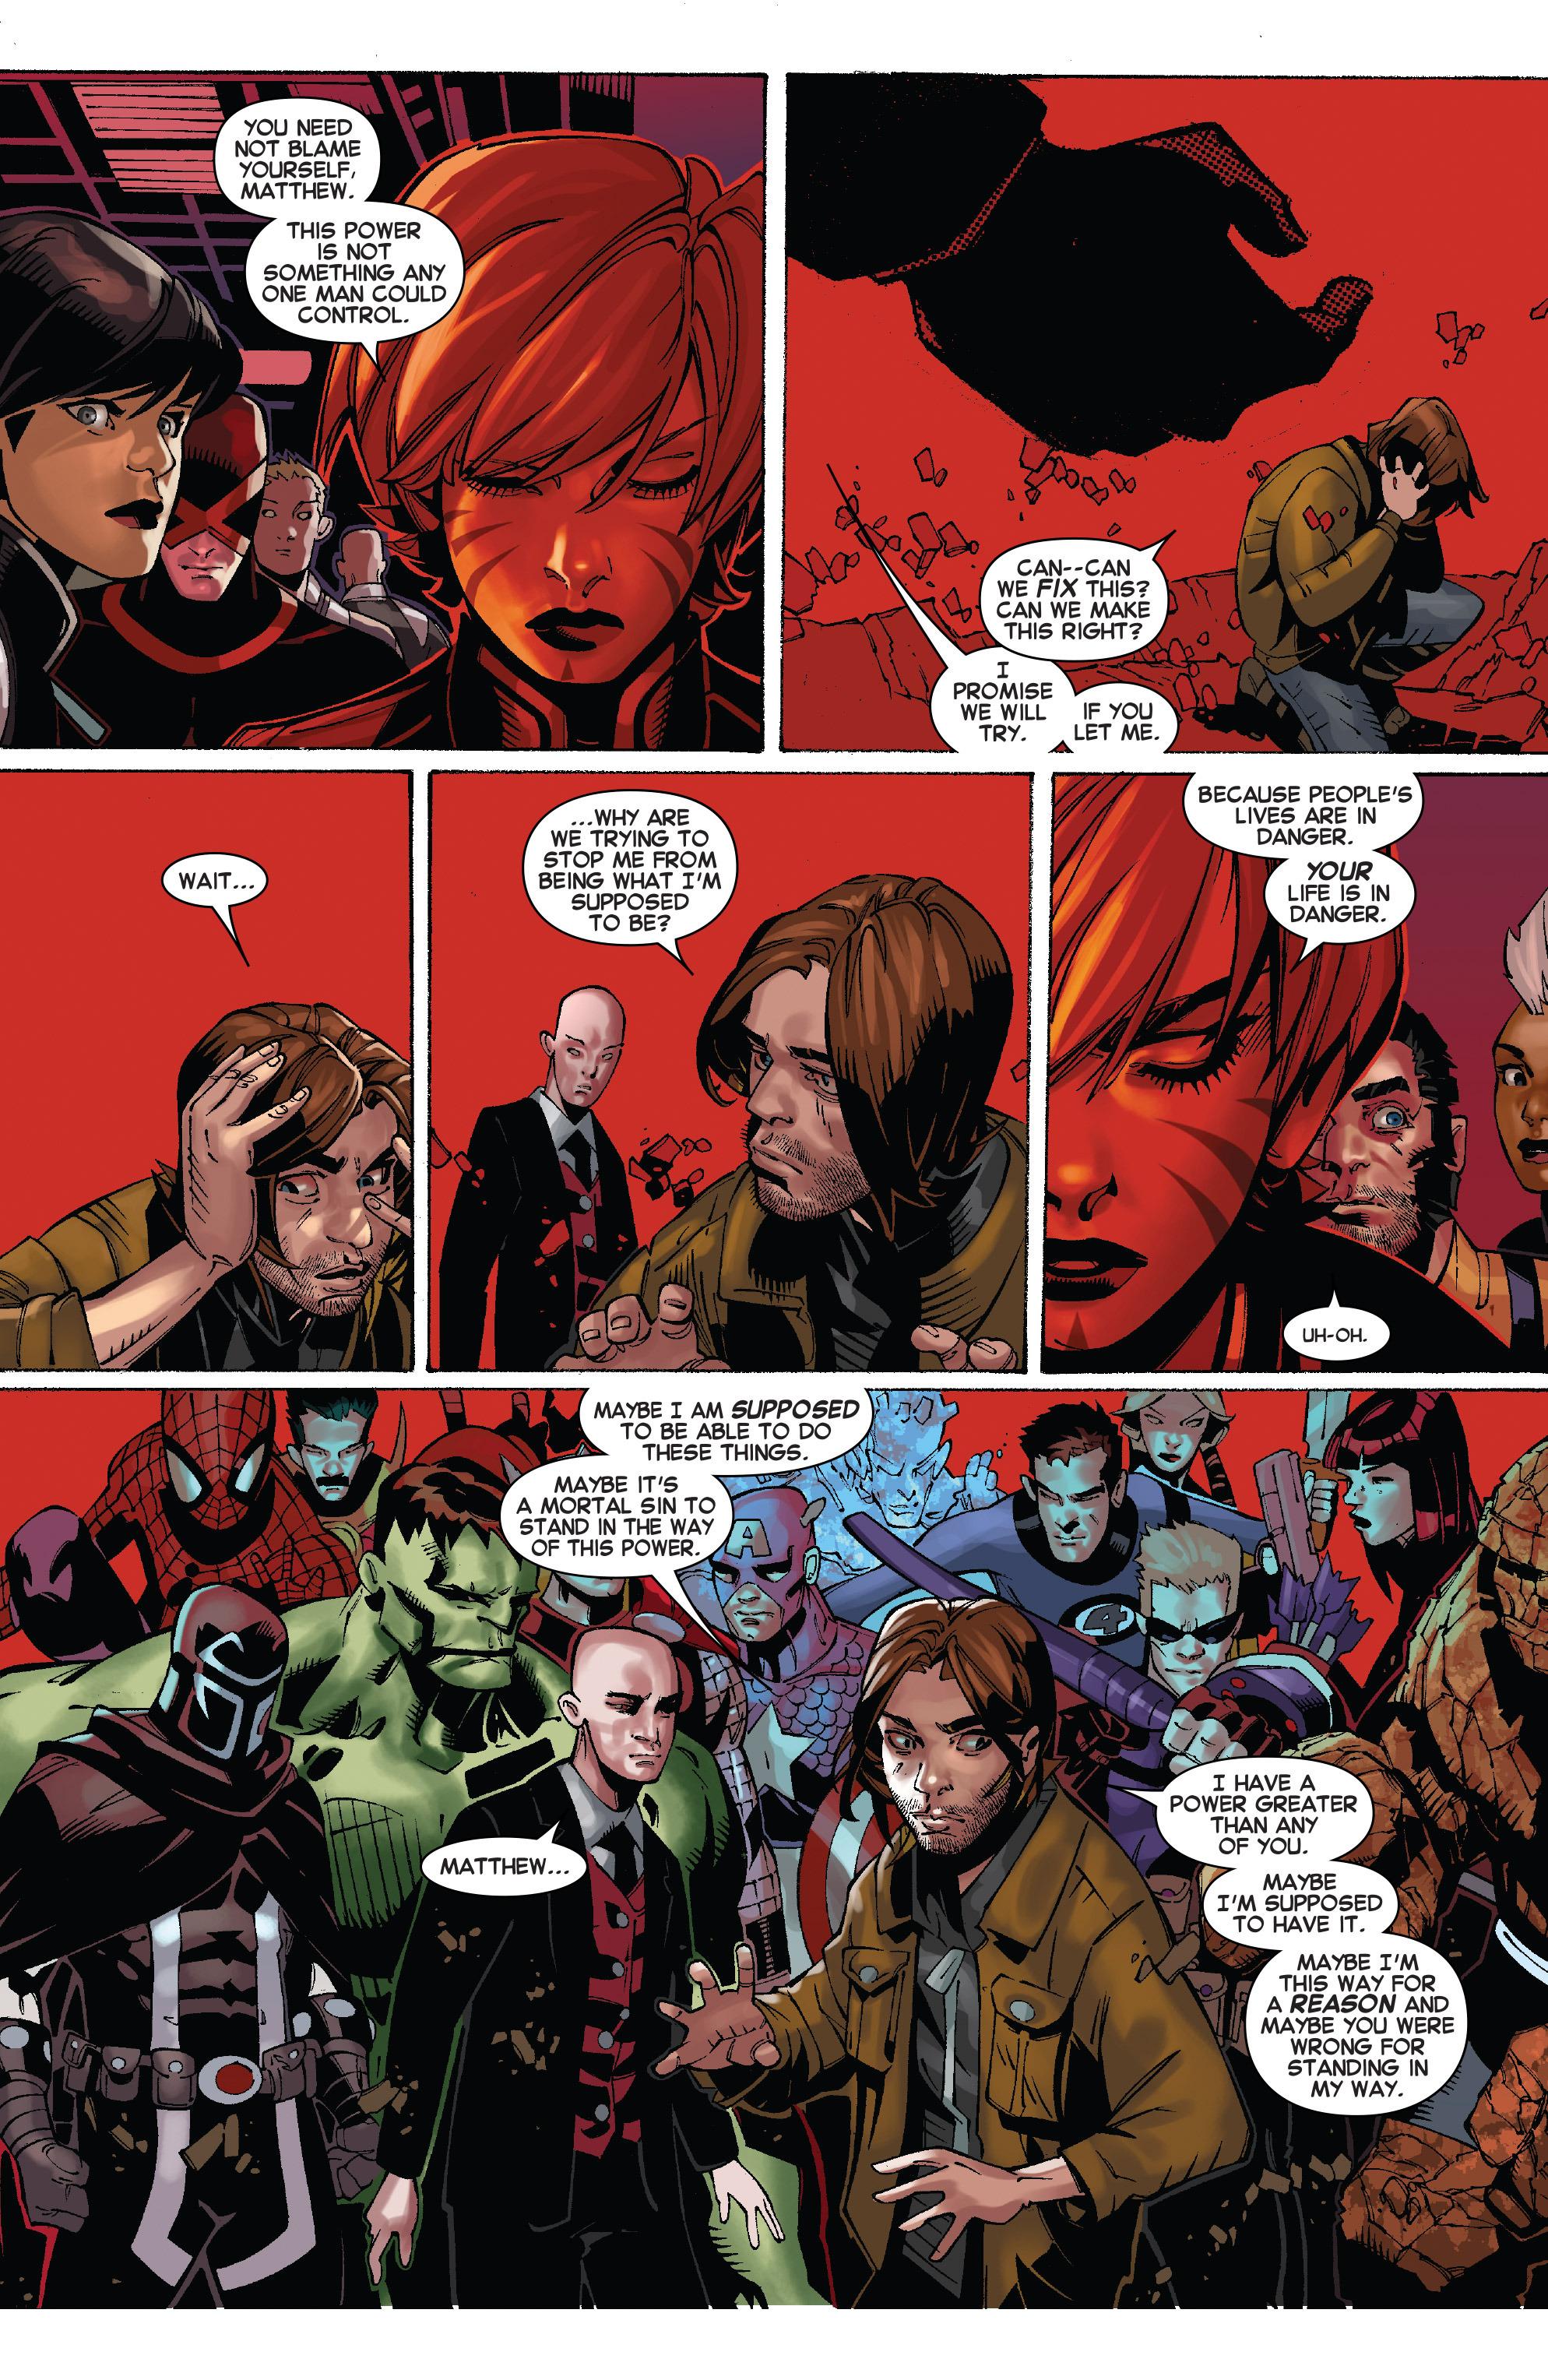 Read online Uncanny X-Men (2013) comic -  Issue # _TPB 5 - The Omega Mutant - 26